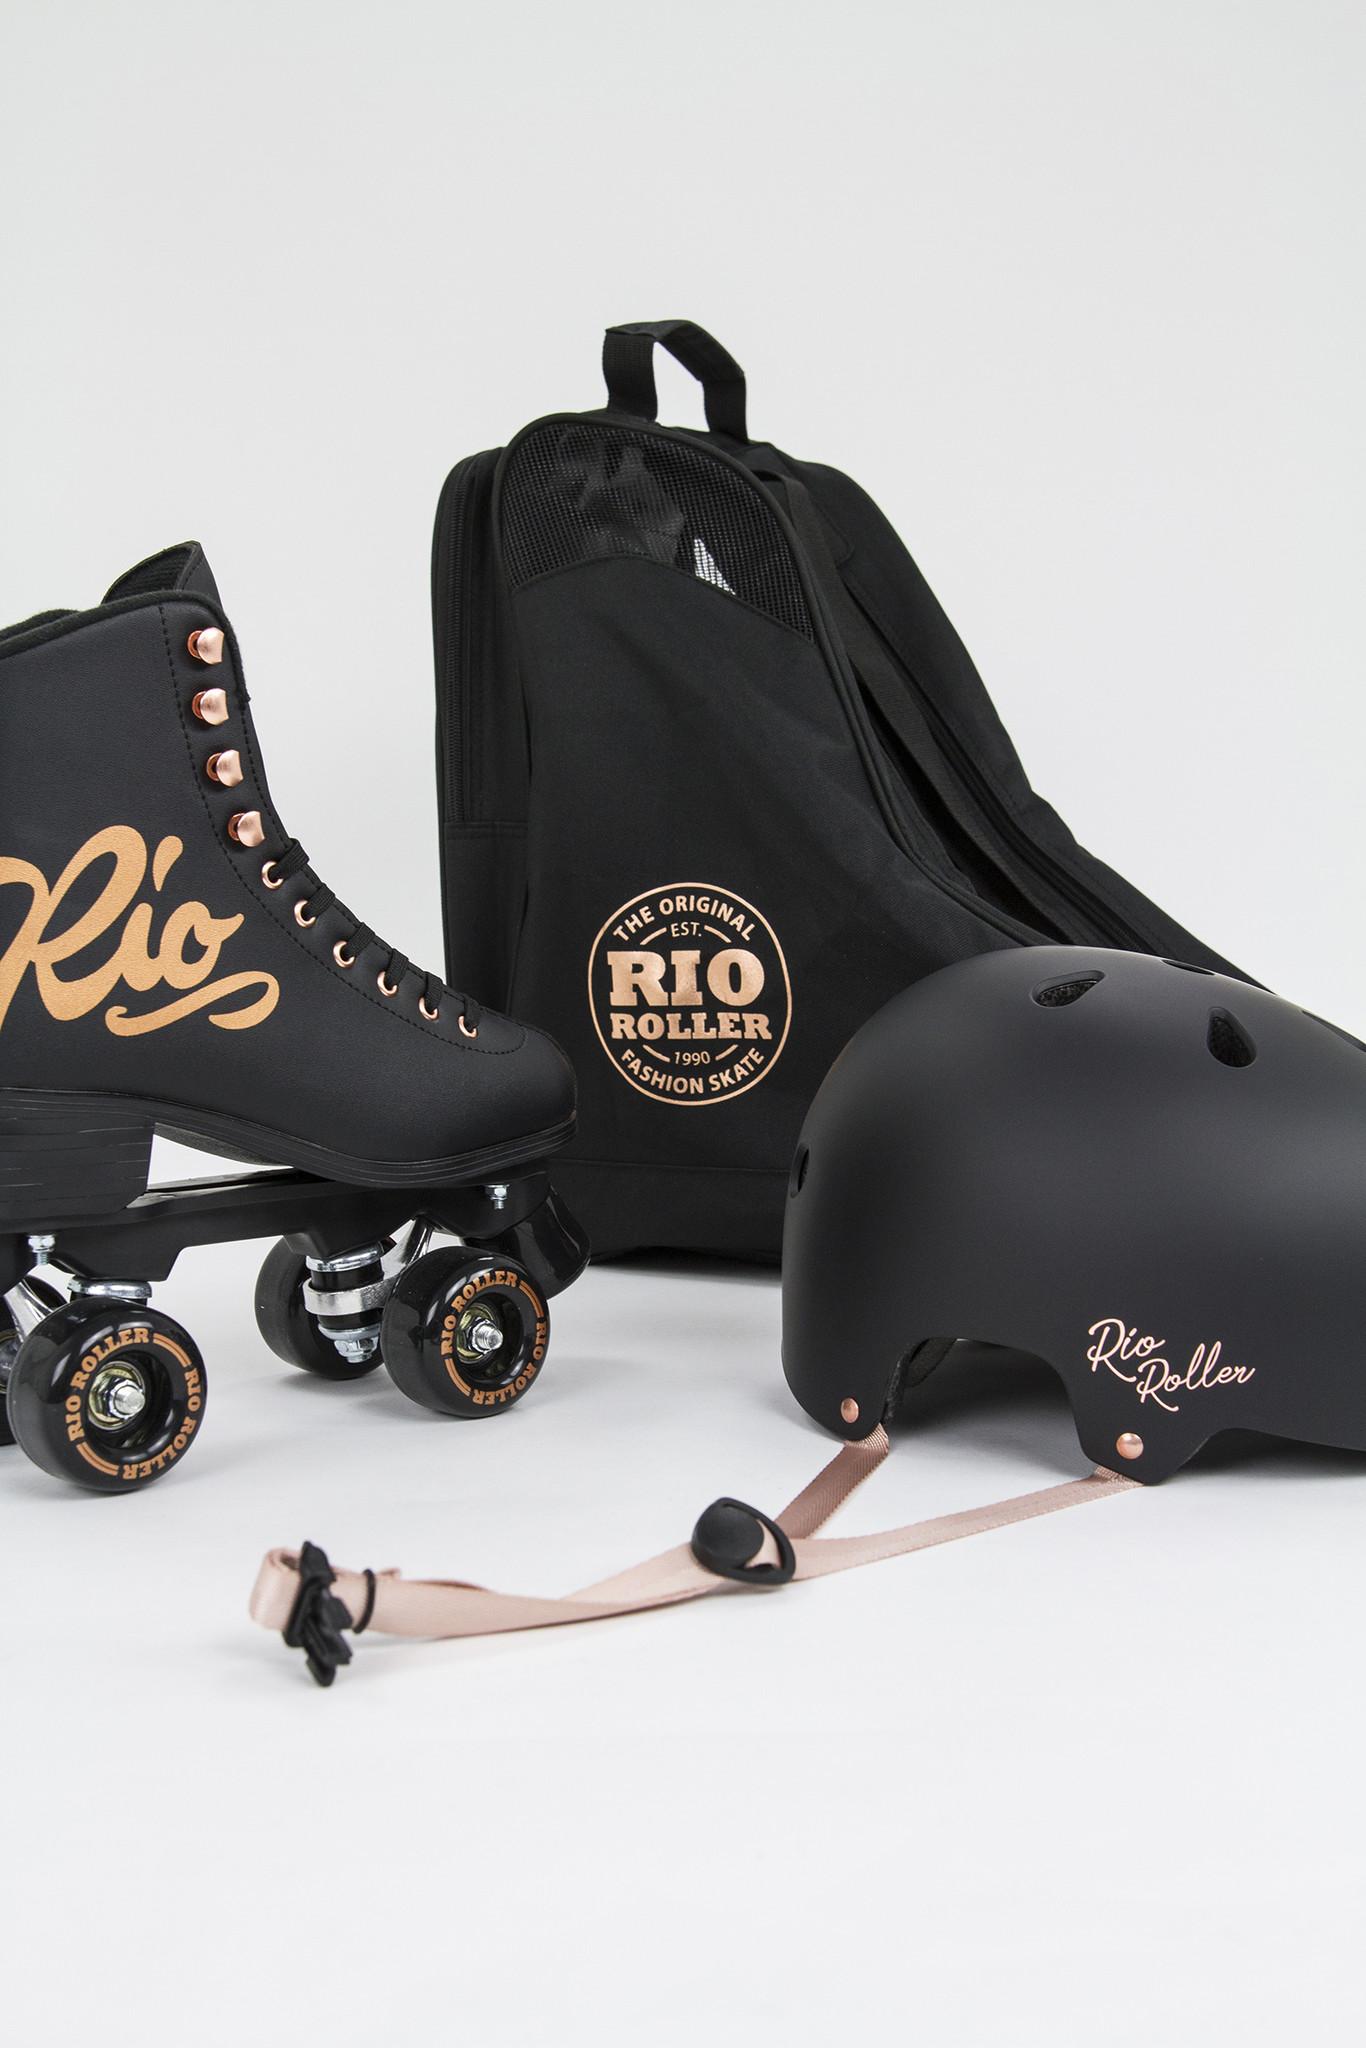 RIO ROLLER RIO ROLLER ROSE ROLLSCHUHE, SCHWARZ